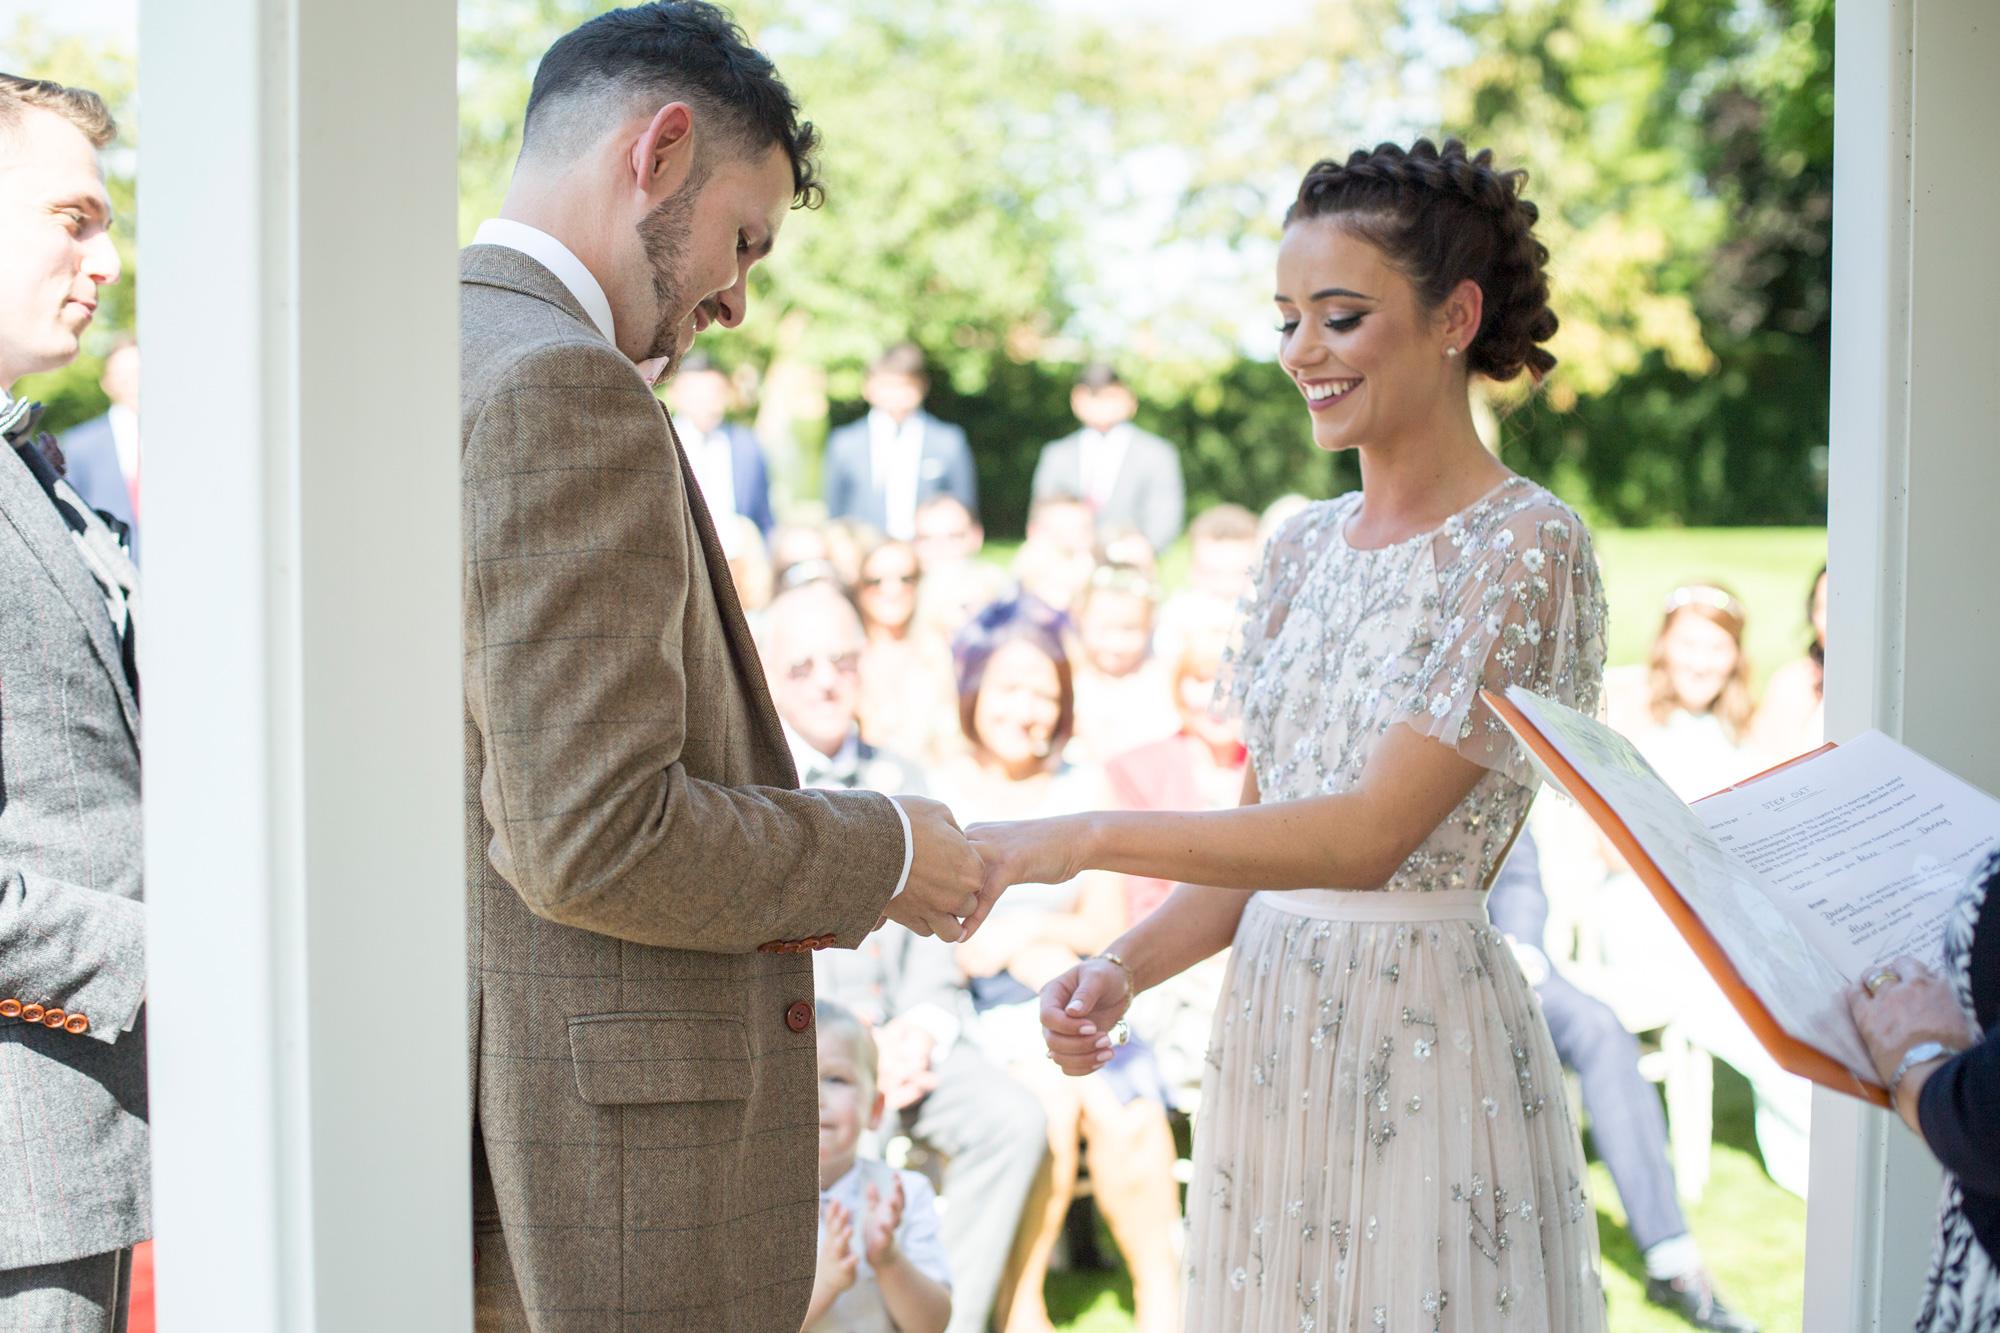 outside ceremony, rings, couple, bride, groom, Horwood House,